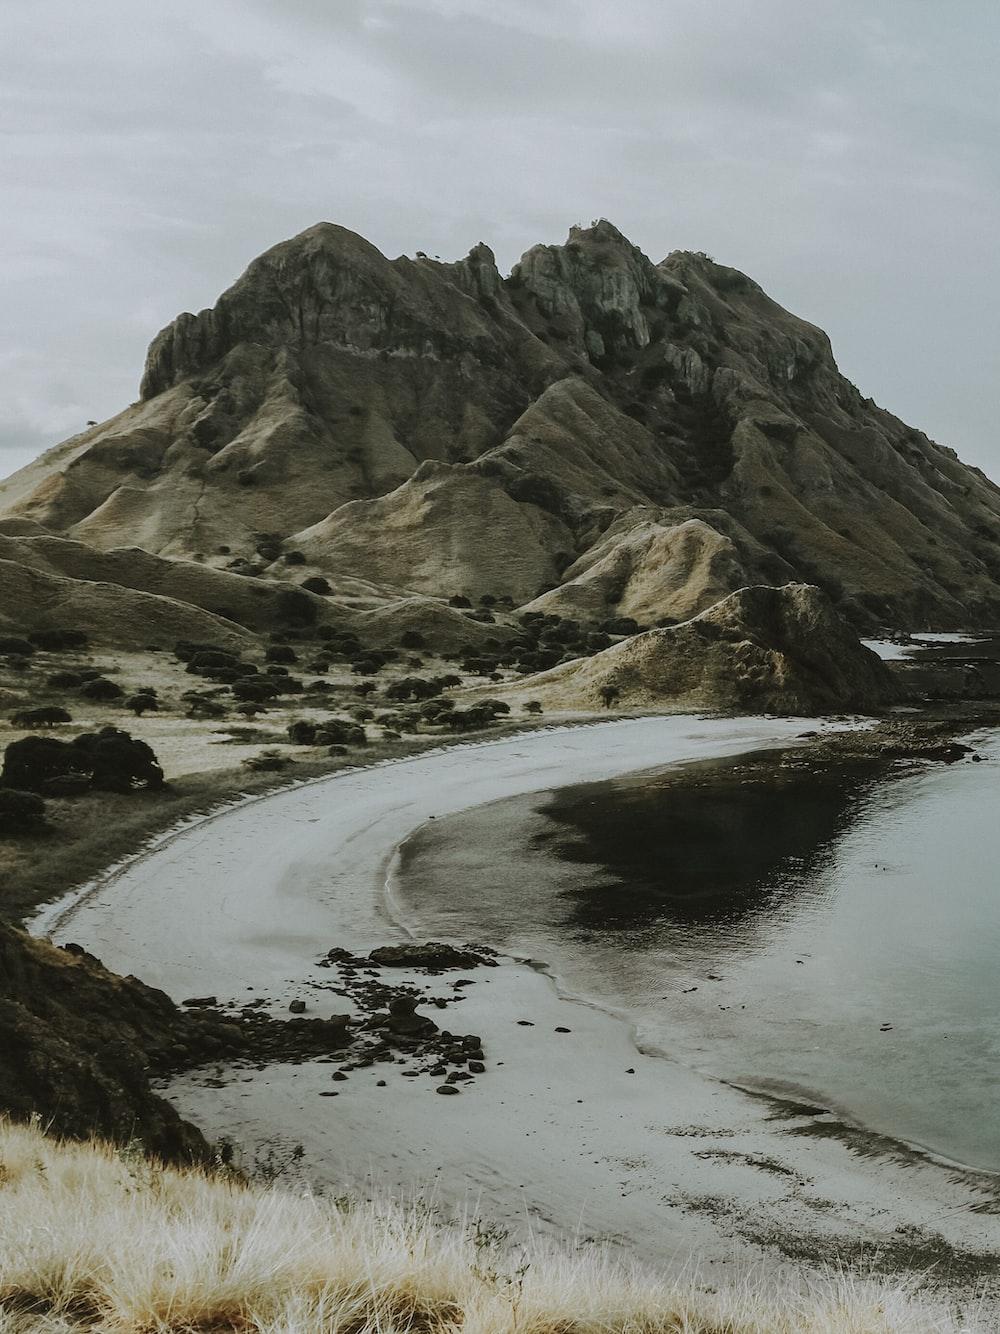 seashore near mountain